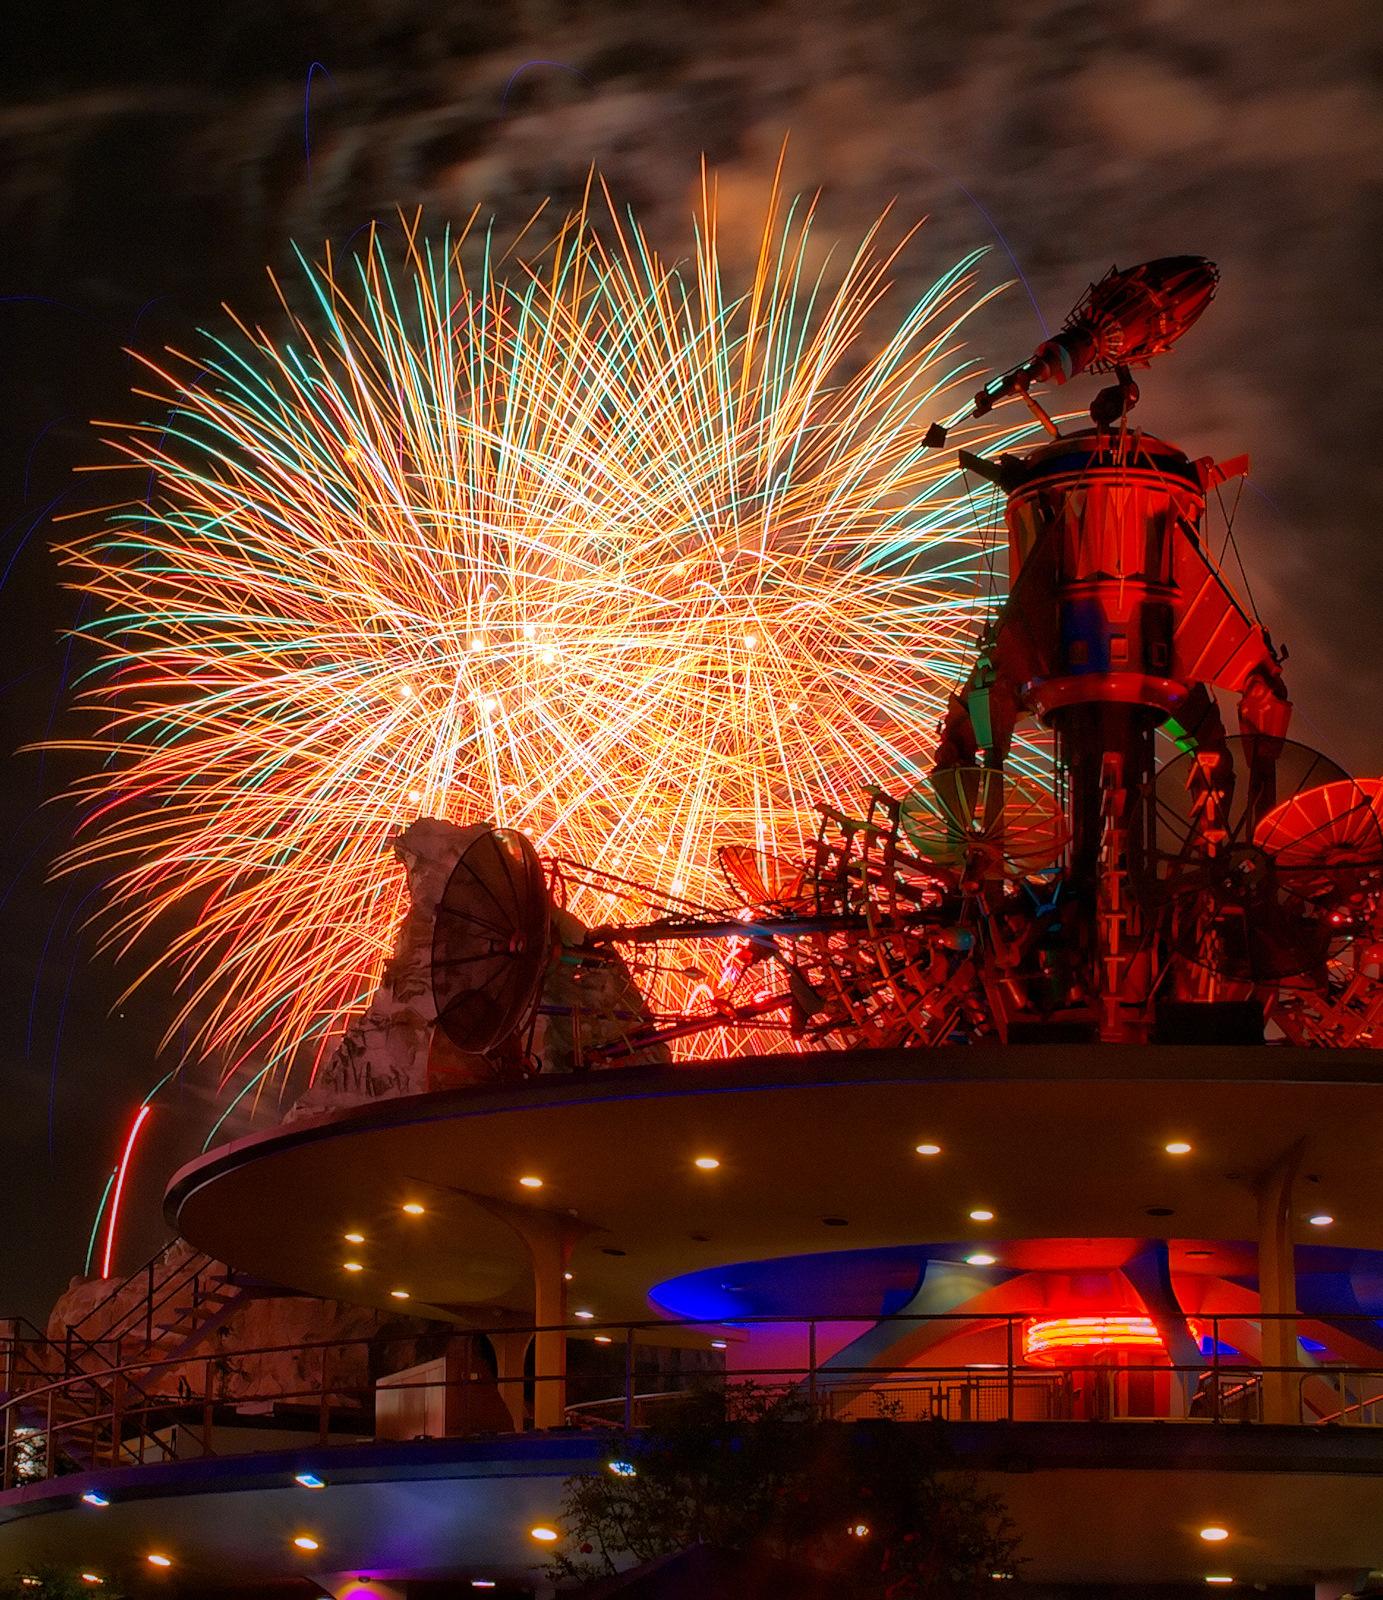 Disney - Remember... Dreams Come True (5) (Explored)